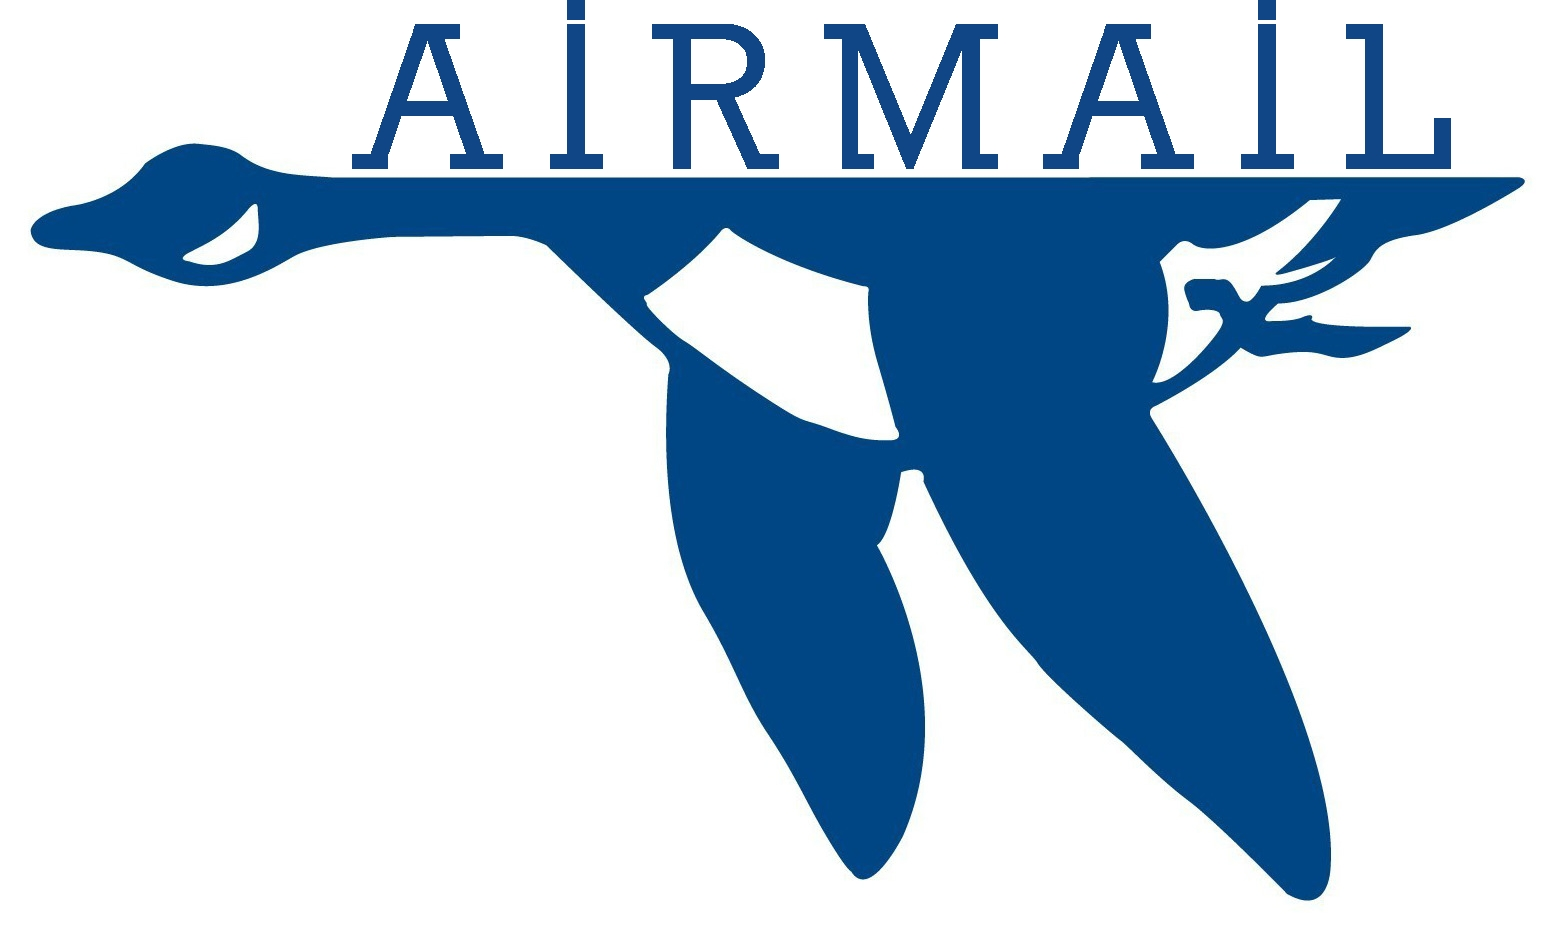 AIRMAIL blue.goose